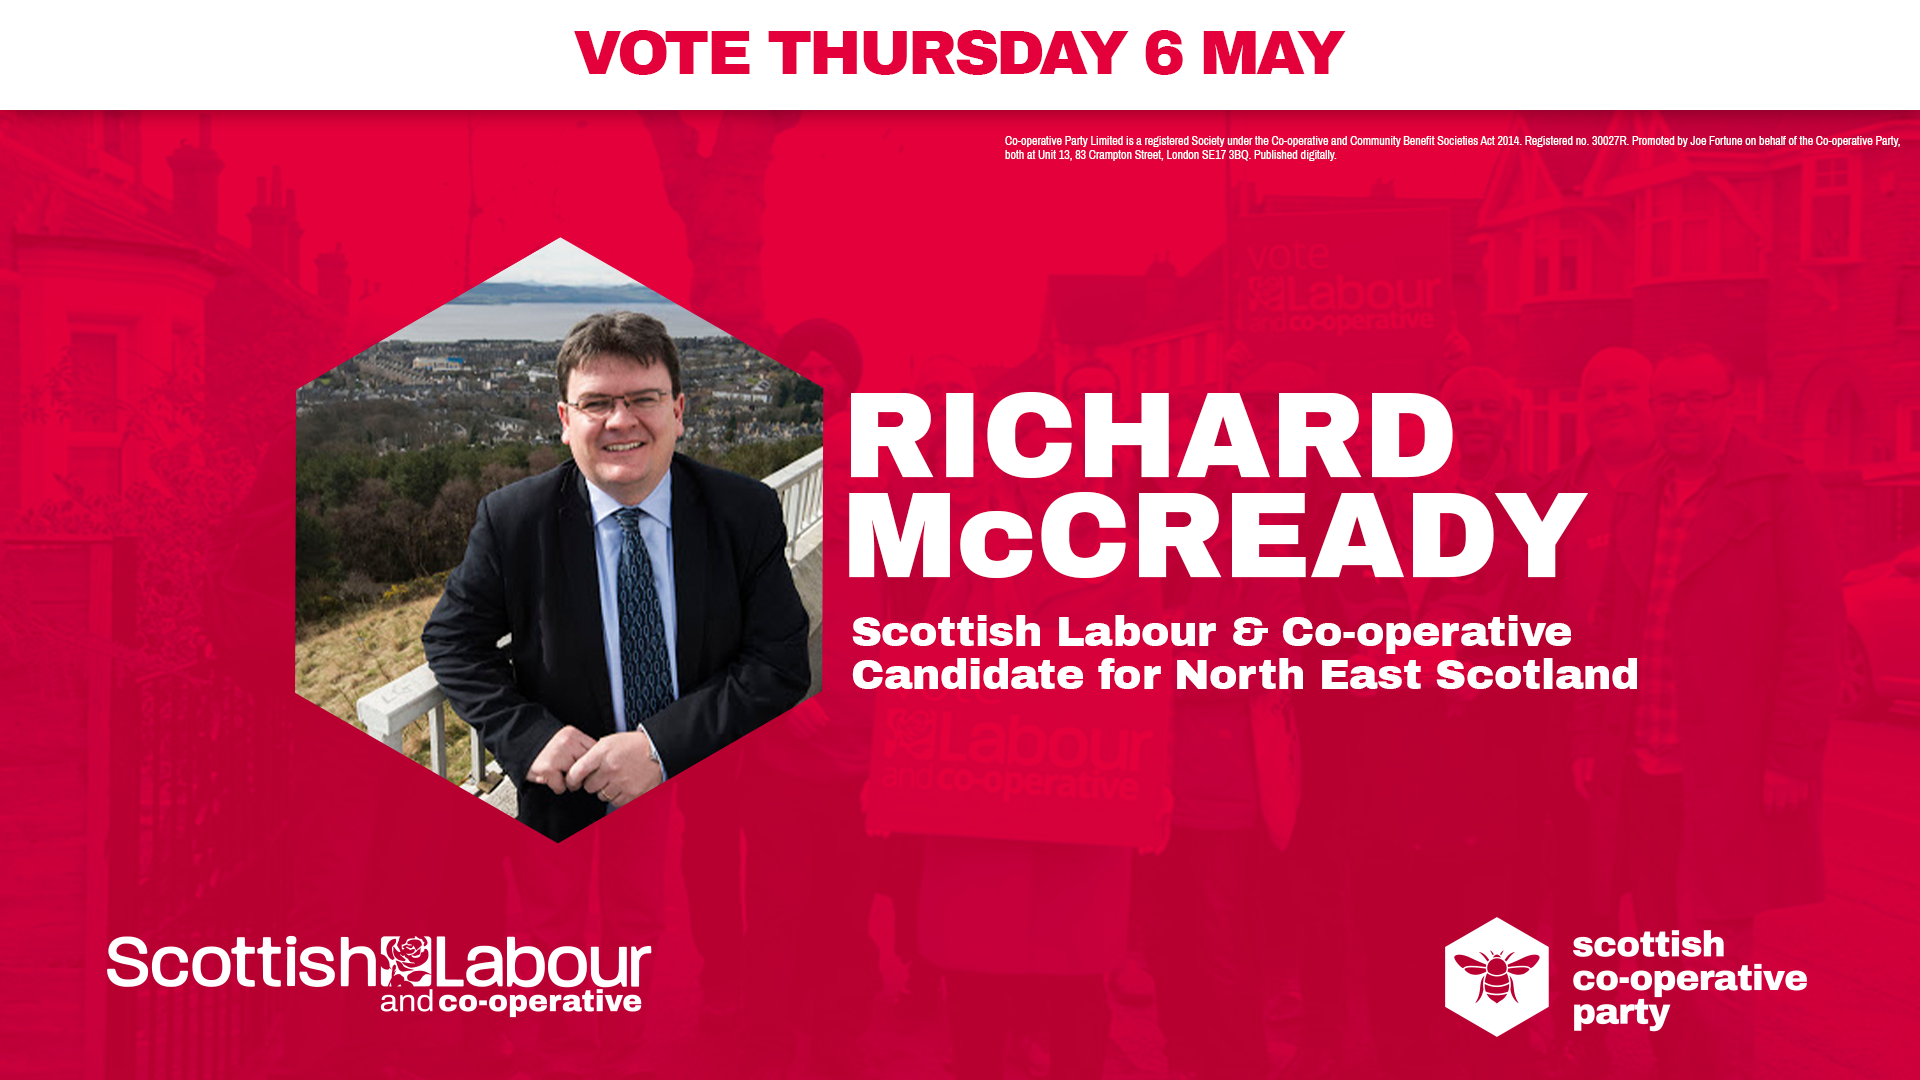 Richard McCready